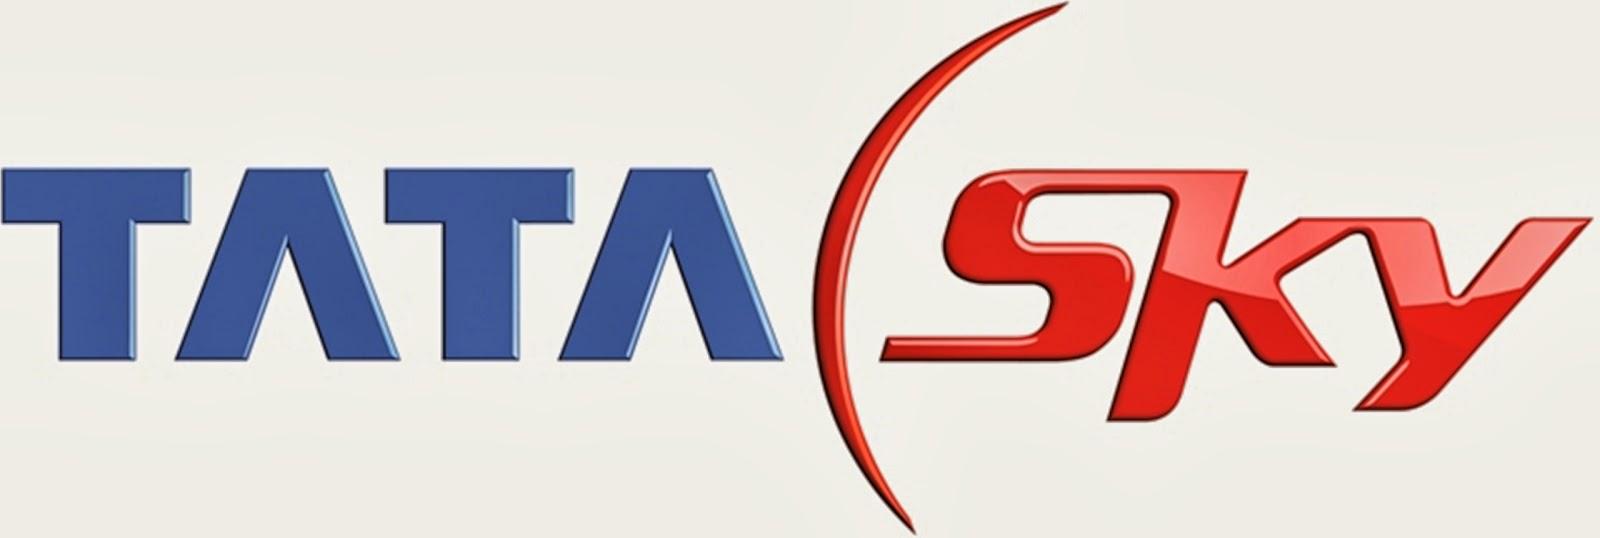 Tatasky USB Dongle Windows Installation Procedure